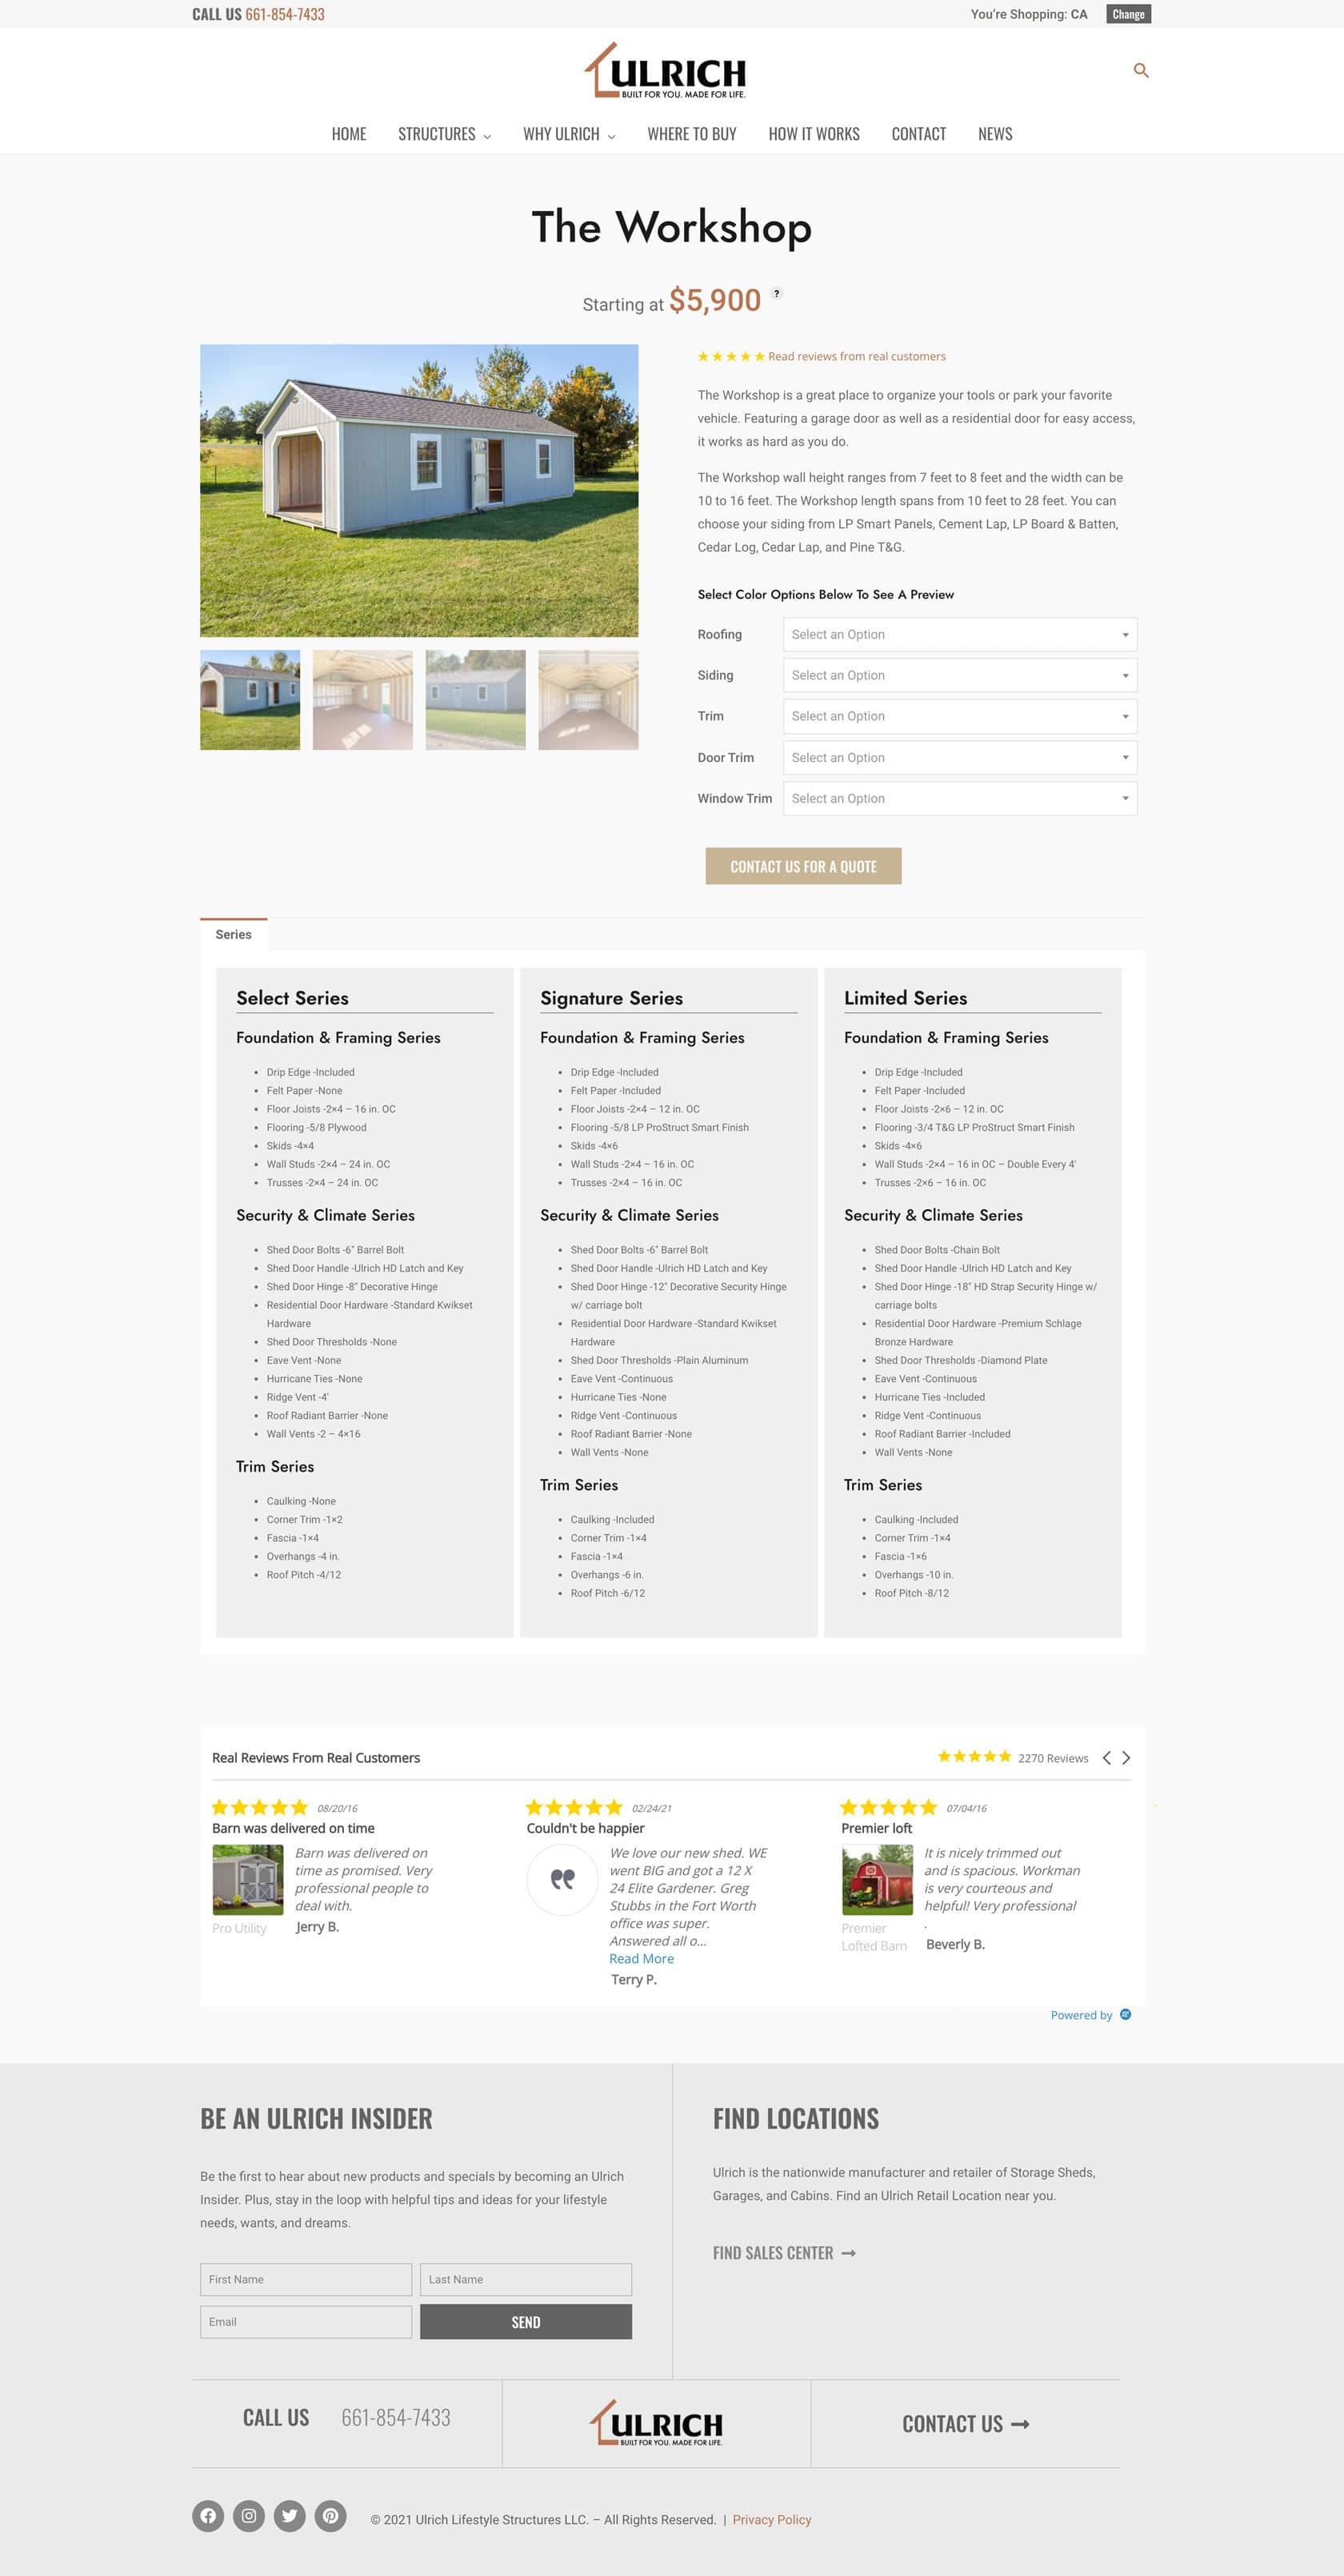 Ulrich Product Page Screenshot